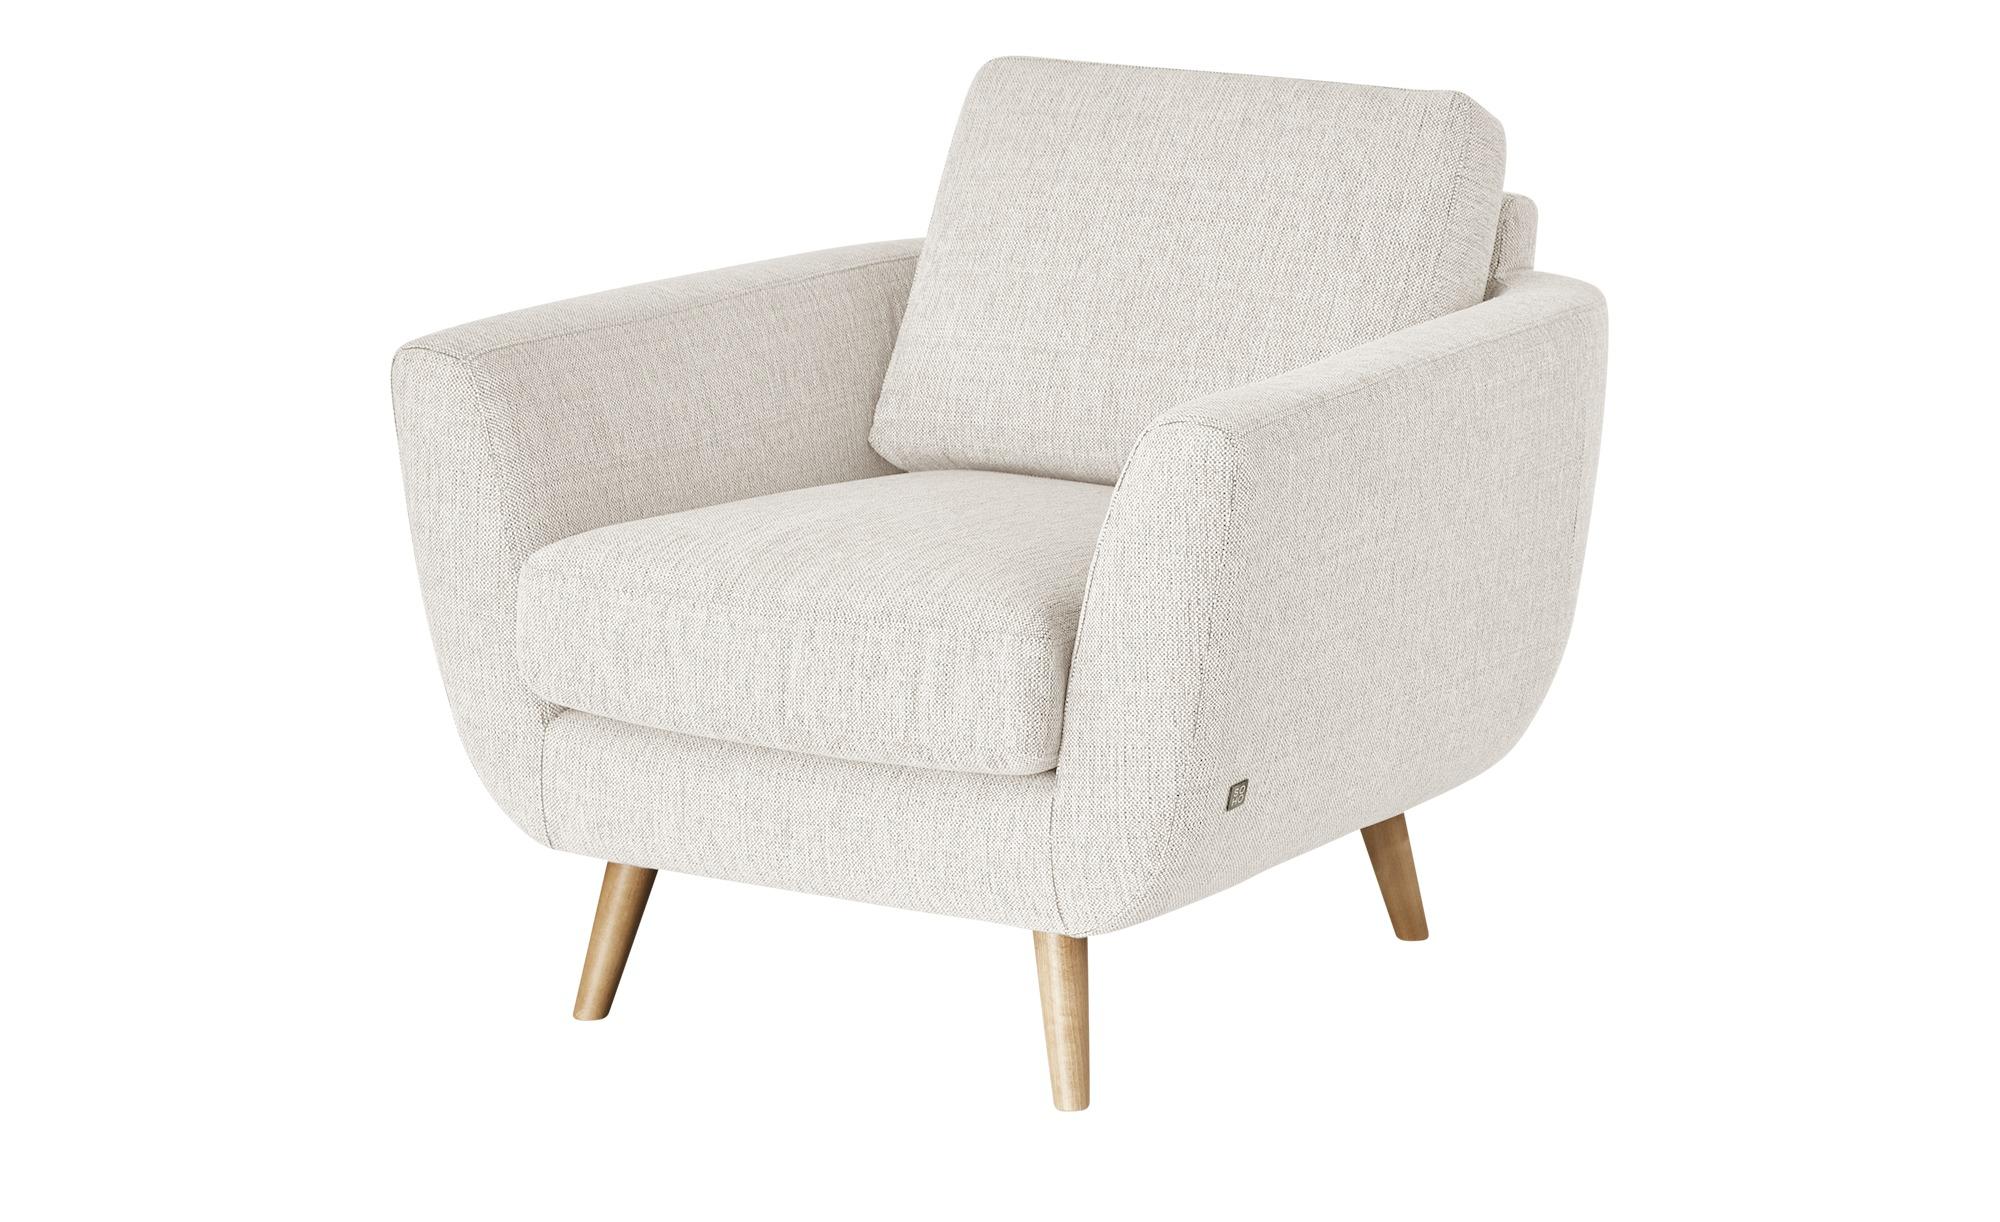 SOHO Sessel  Smilla ¦ weiß ¦ Maße (cm): B: 94 H: 85 T: 93 Polstermöbel > Sessel > Ohrensessel - Höffner